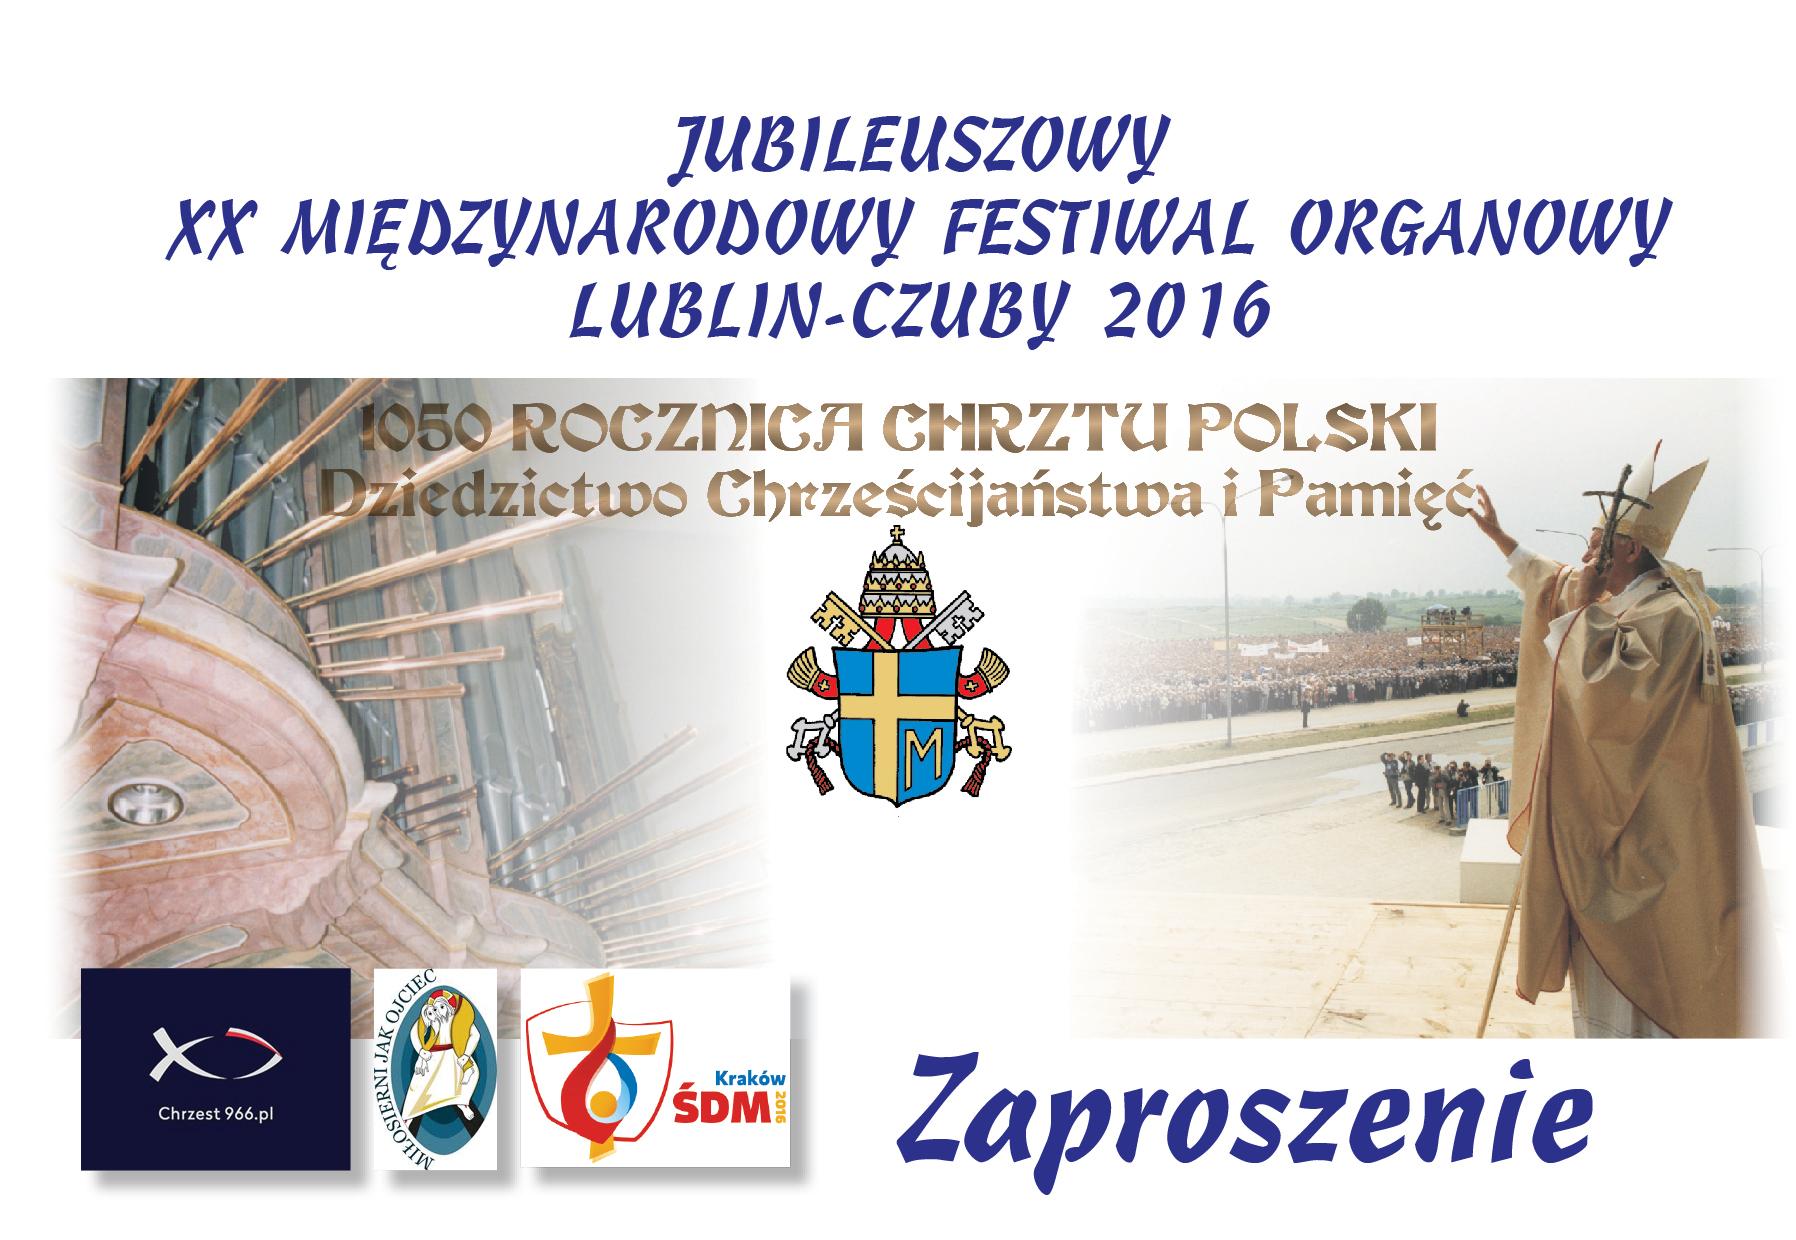 Międzynarodowy Festiwal Organowy Lublin – Czuby